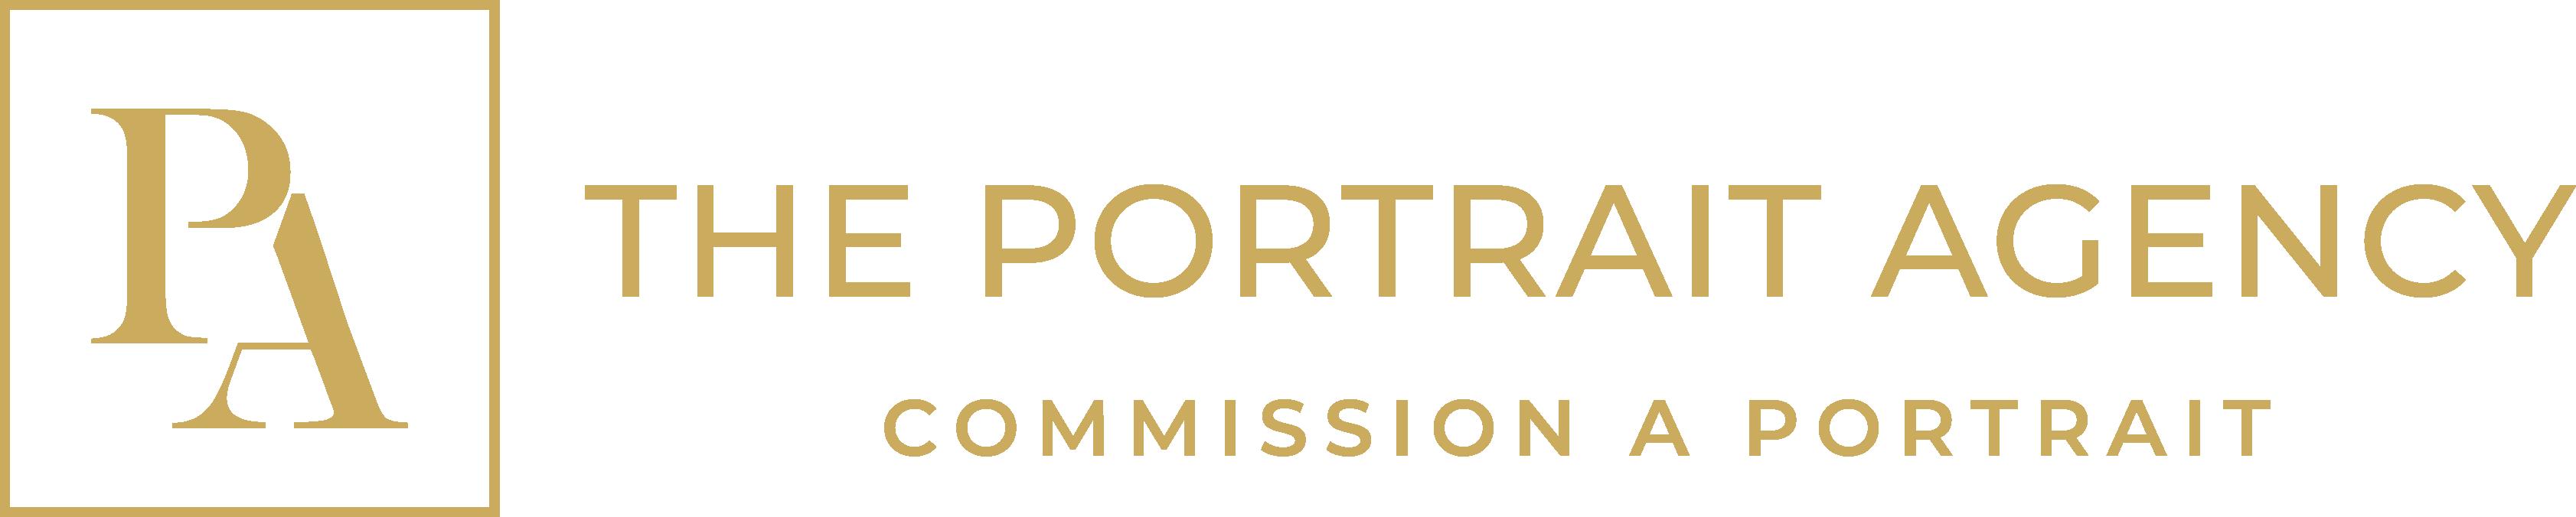 The Portrait Agency